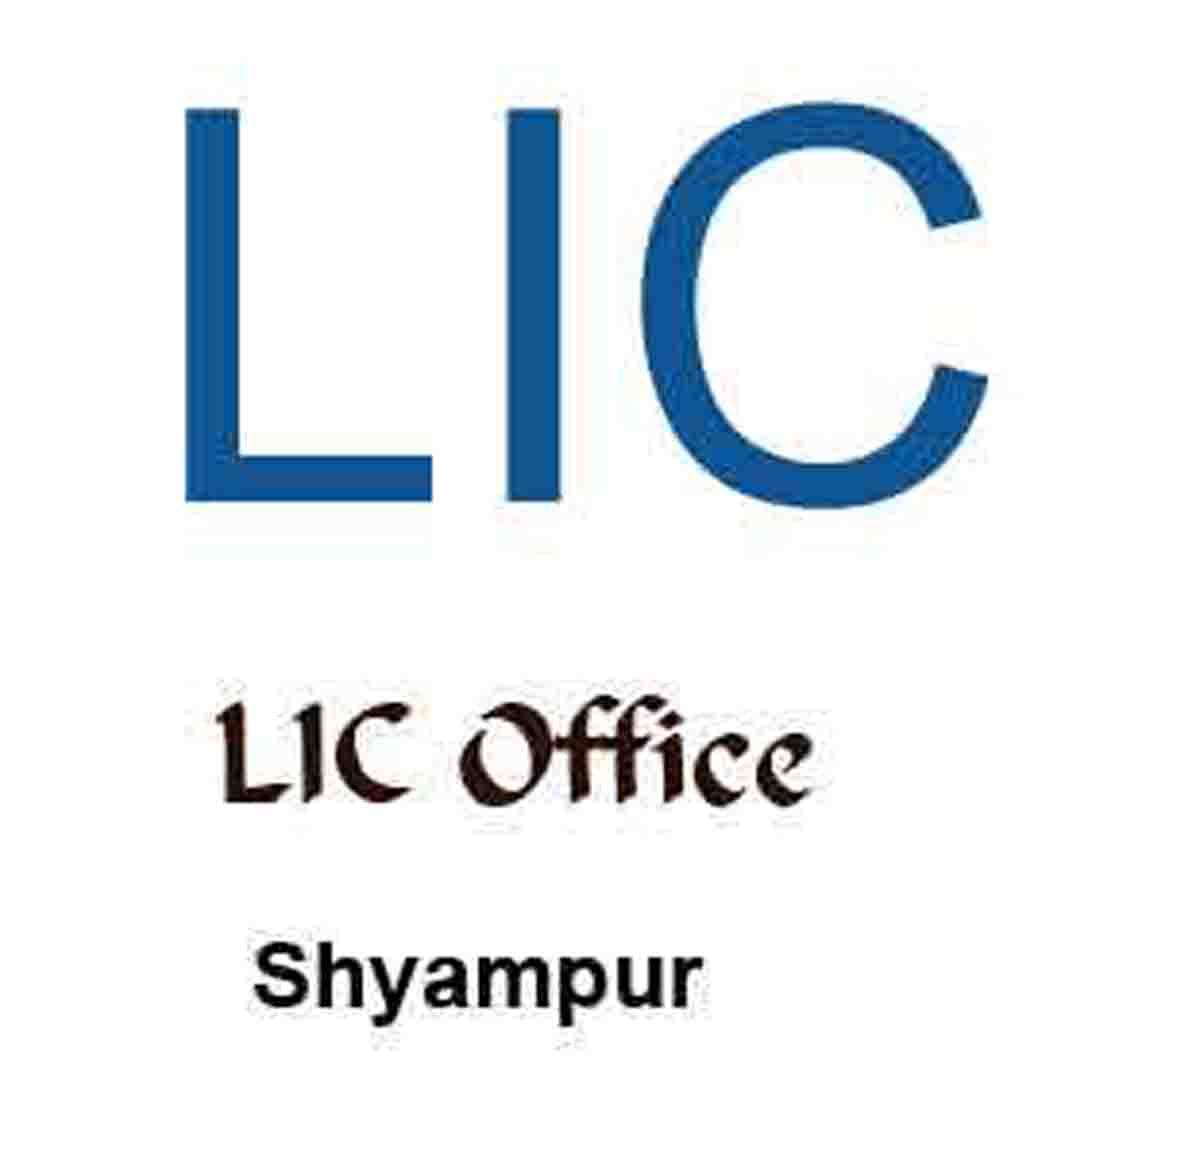 lic office shyampur